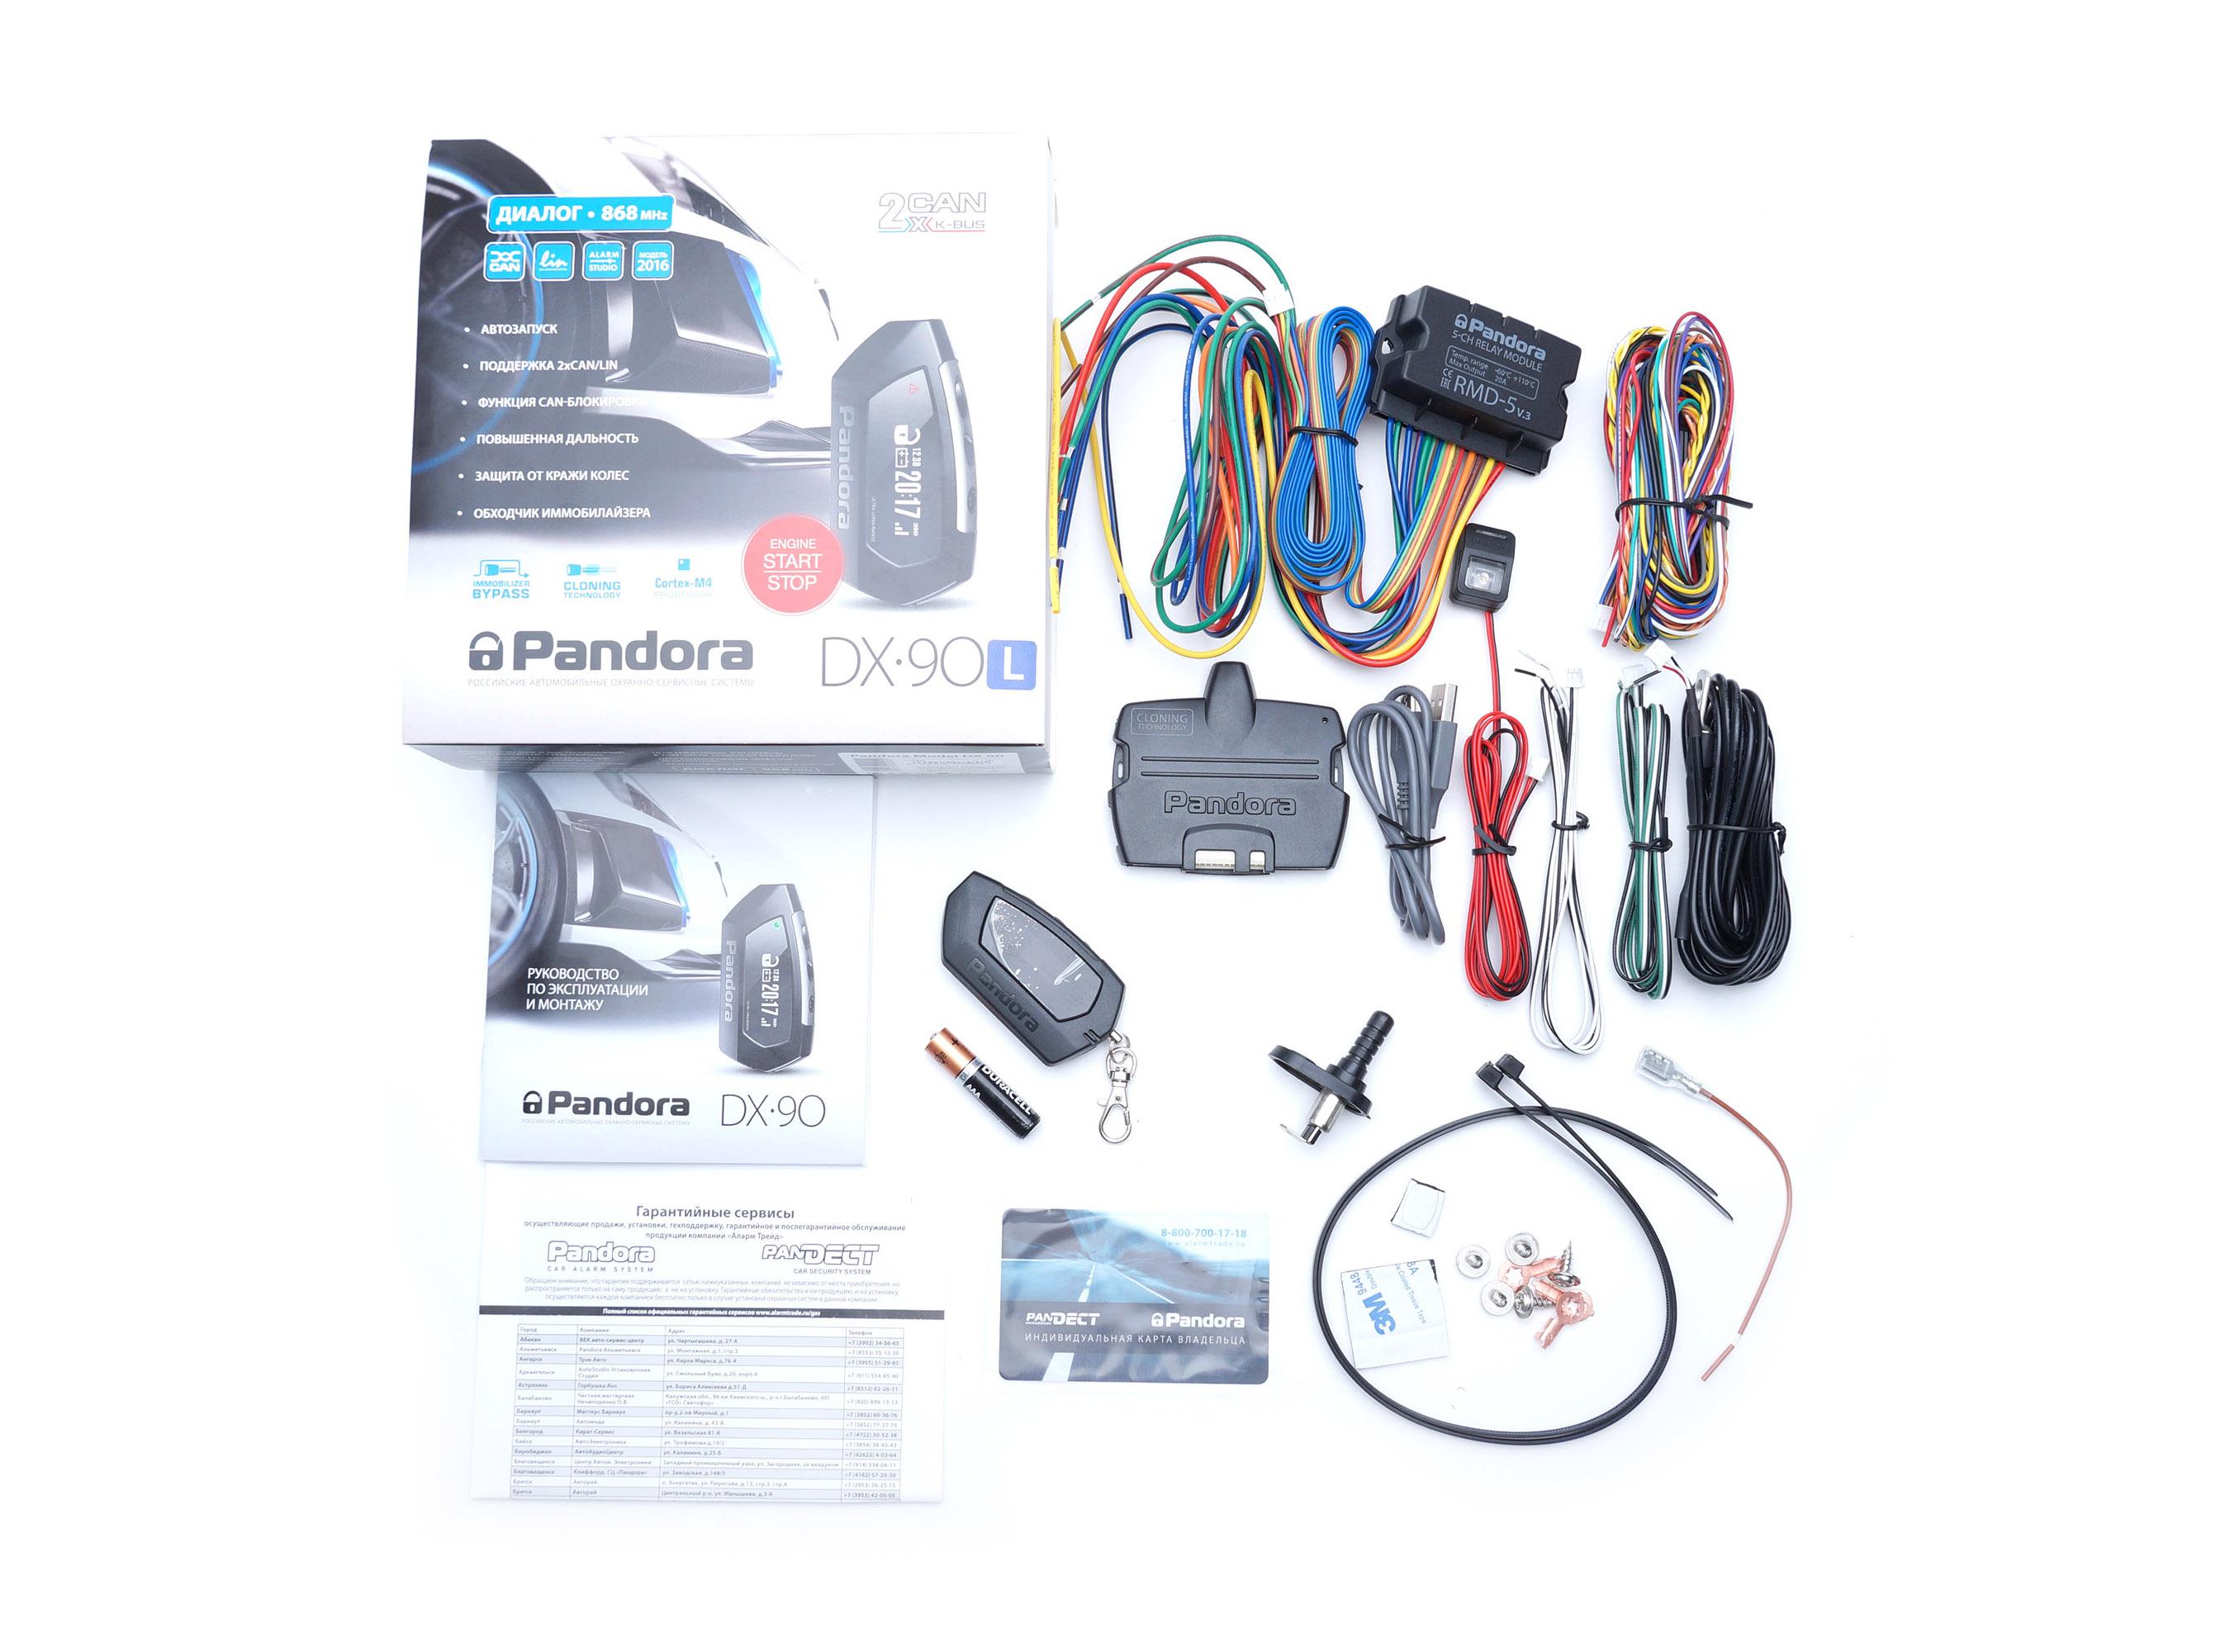 Pandora DX-90. Инструкции по монтажу и эксплуатации